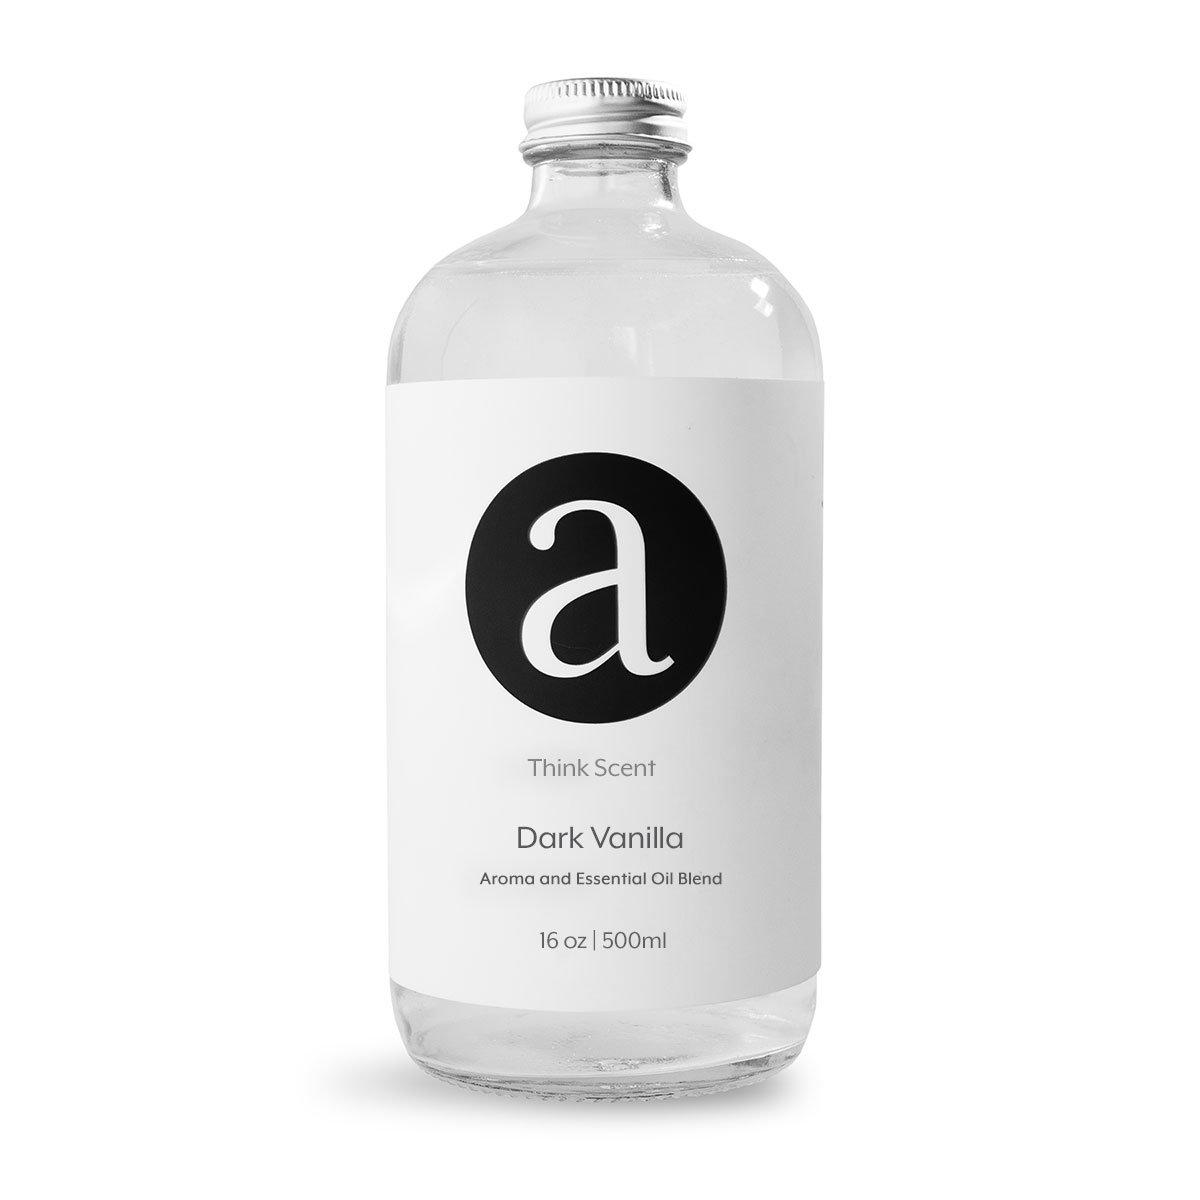 (Dark Vanilla) Aroma / Fragrance Oil For AromaTech Air Freshener Scent Diffuser (500ml)